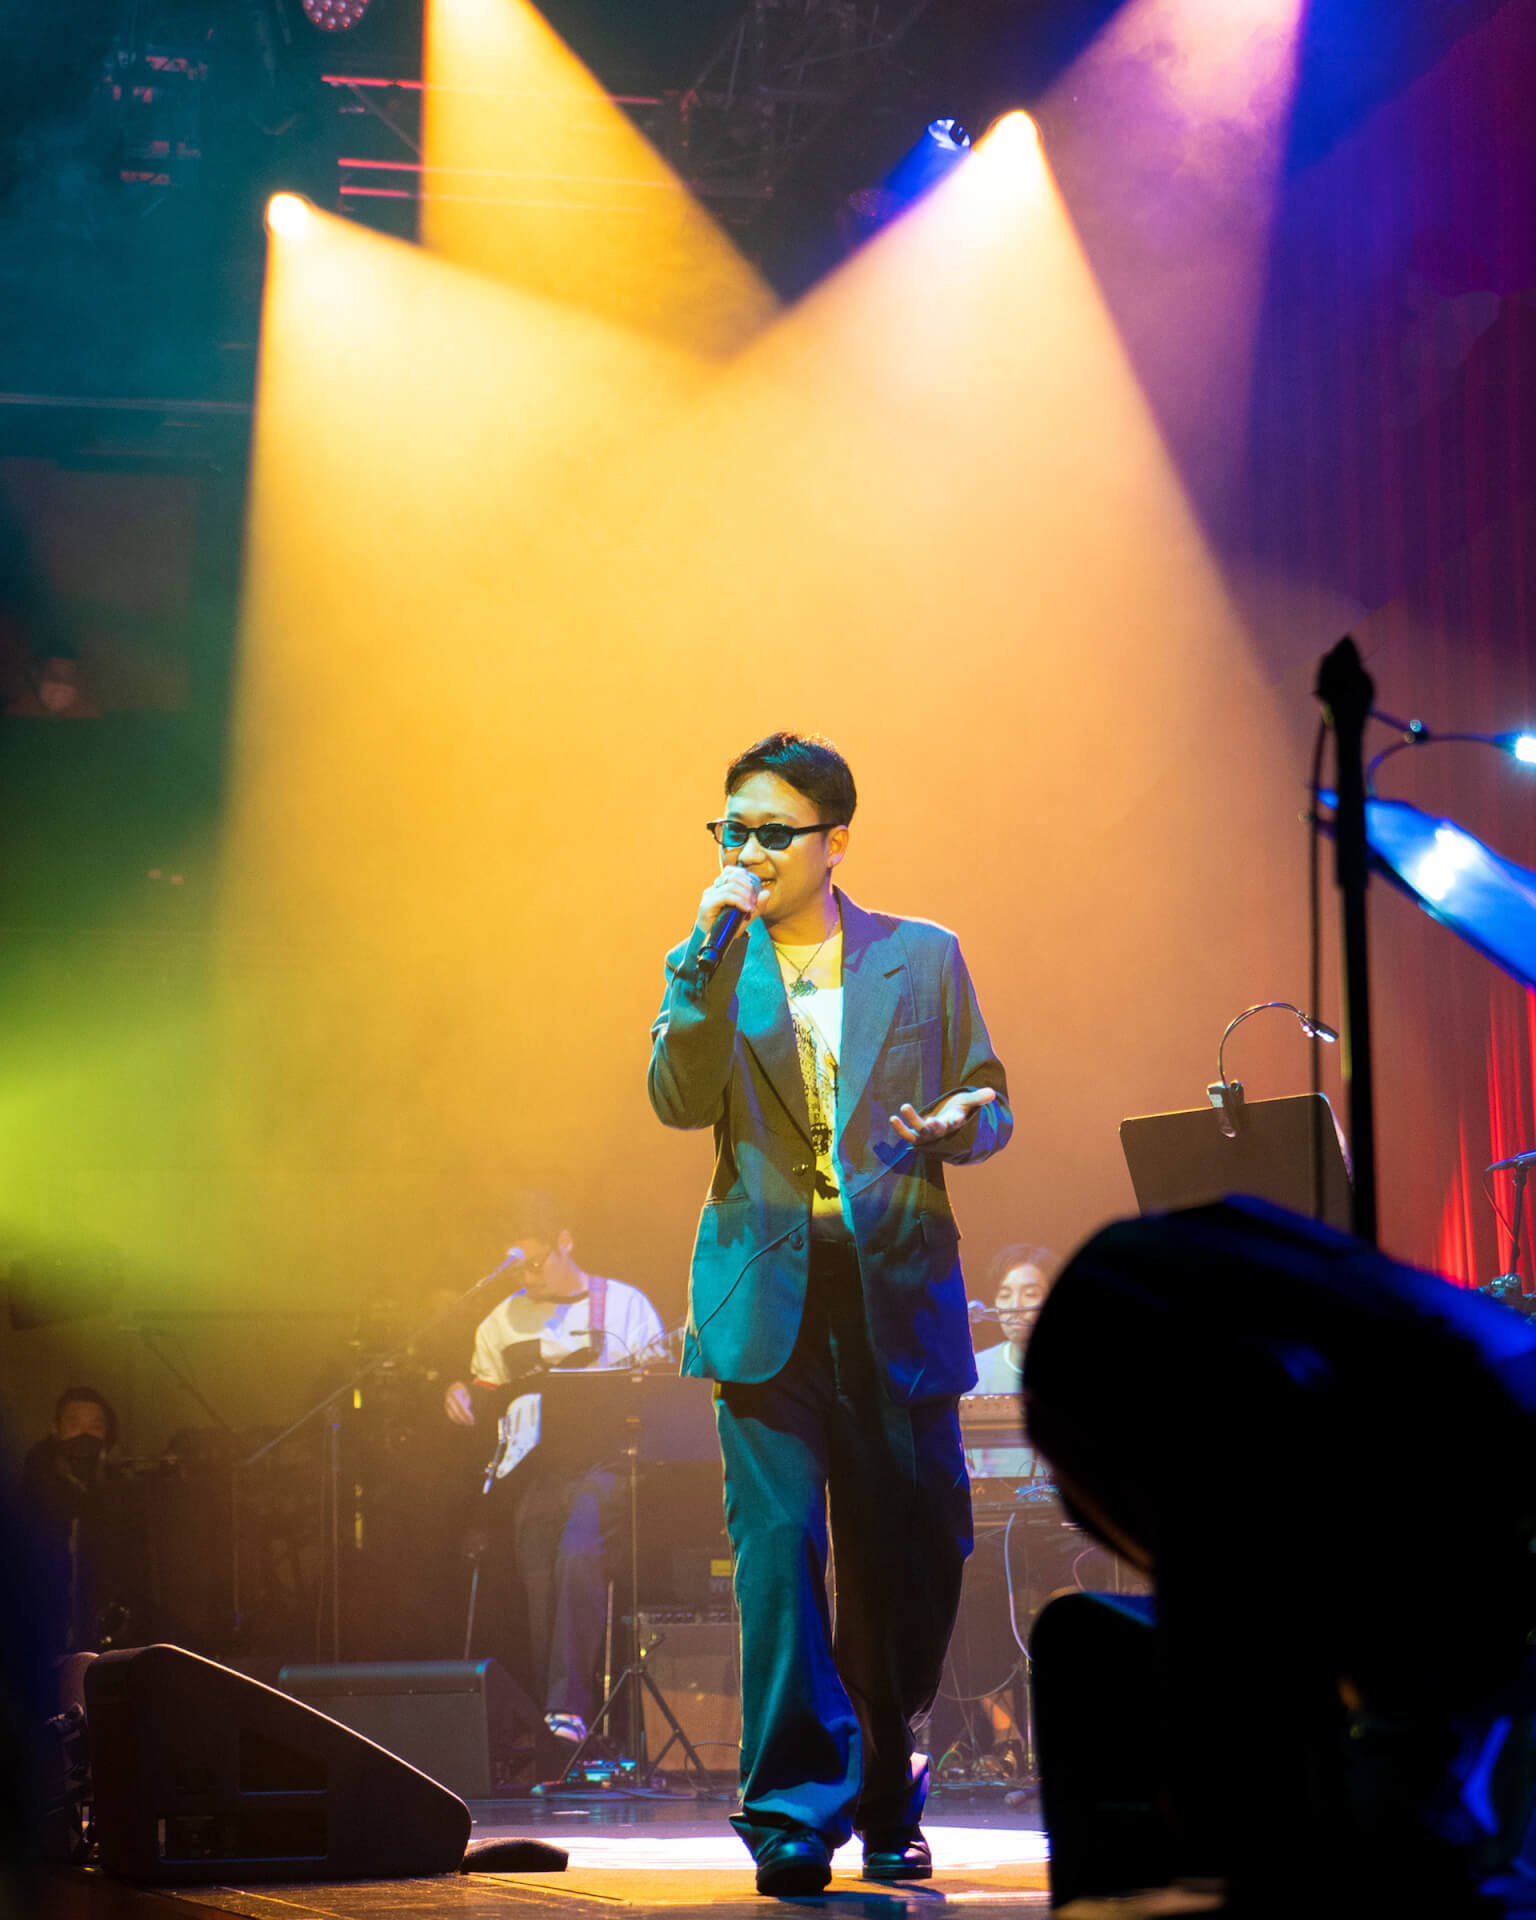 BIM初のビルボードライブ公演のライブレポートが到着!バンドセットでPUNPEE、kZm、STUTSらと共演 music201112_bim_live_16